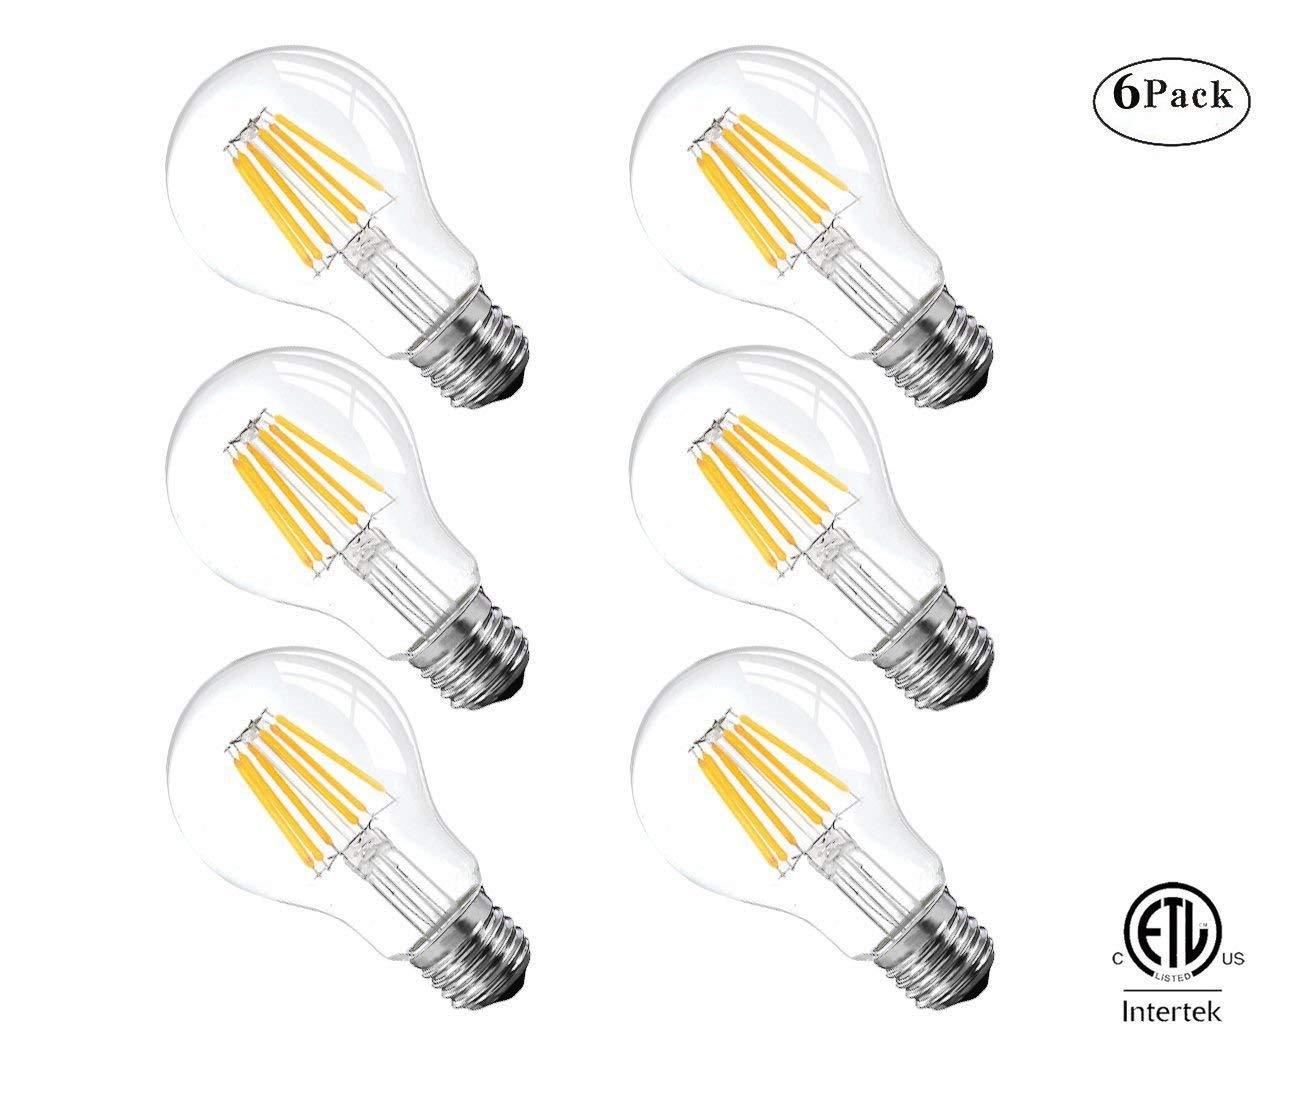 Vintage Edison LED Bulb, 6W Antique LED Bulb,Classic A19/A60 LED Light Bulbs, E26 Medium Base Lamp, 2700K Warm White, 600 Lumens,60 Watt Equivalent, Clear Glass Cover,Not-Dimmable,ETL Listed,6 Pack